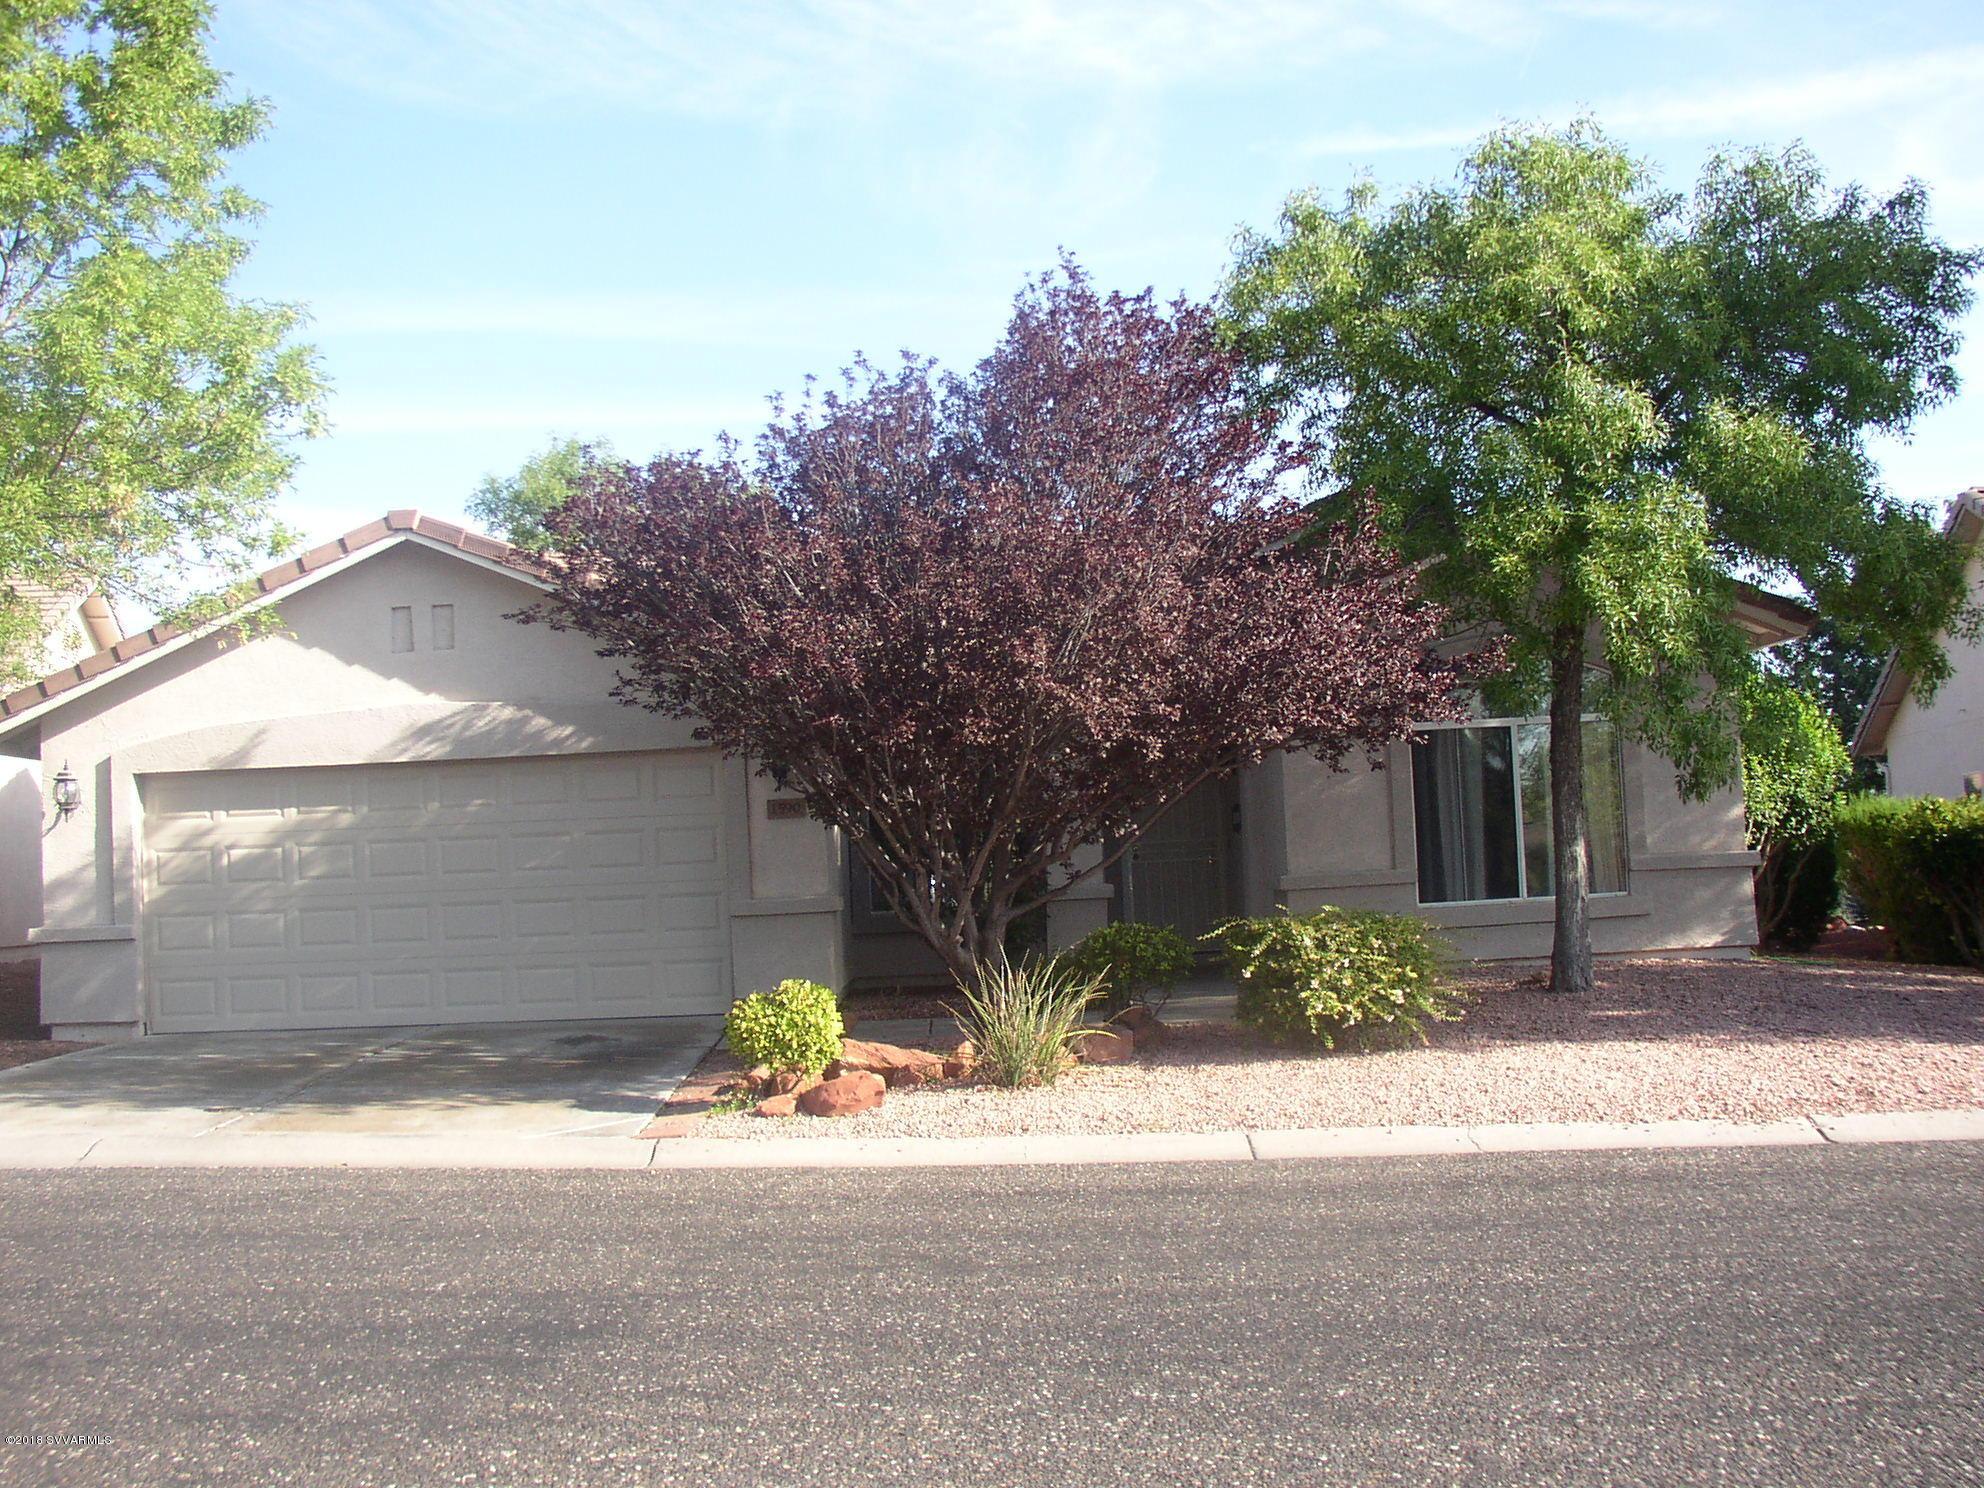 1590 W Wagon Wheel Rd Cottonwood, AZ 86326